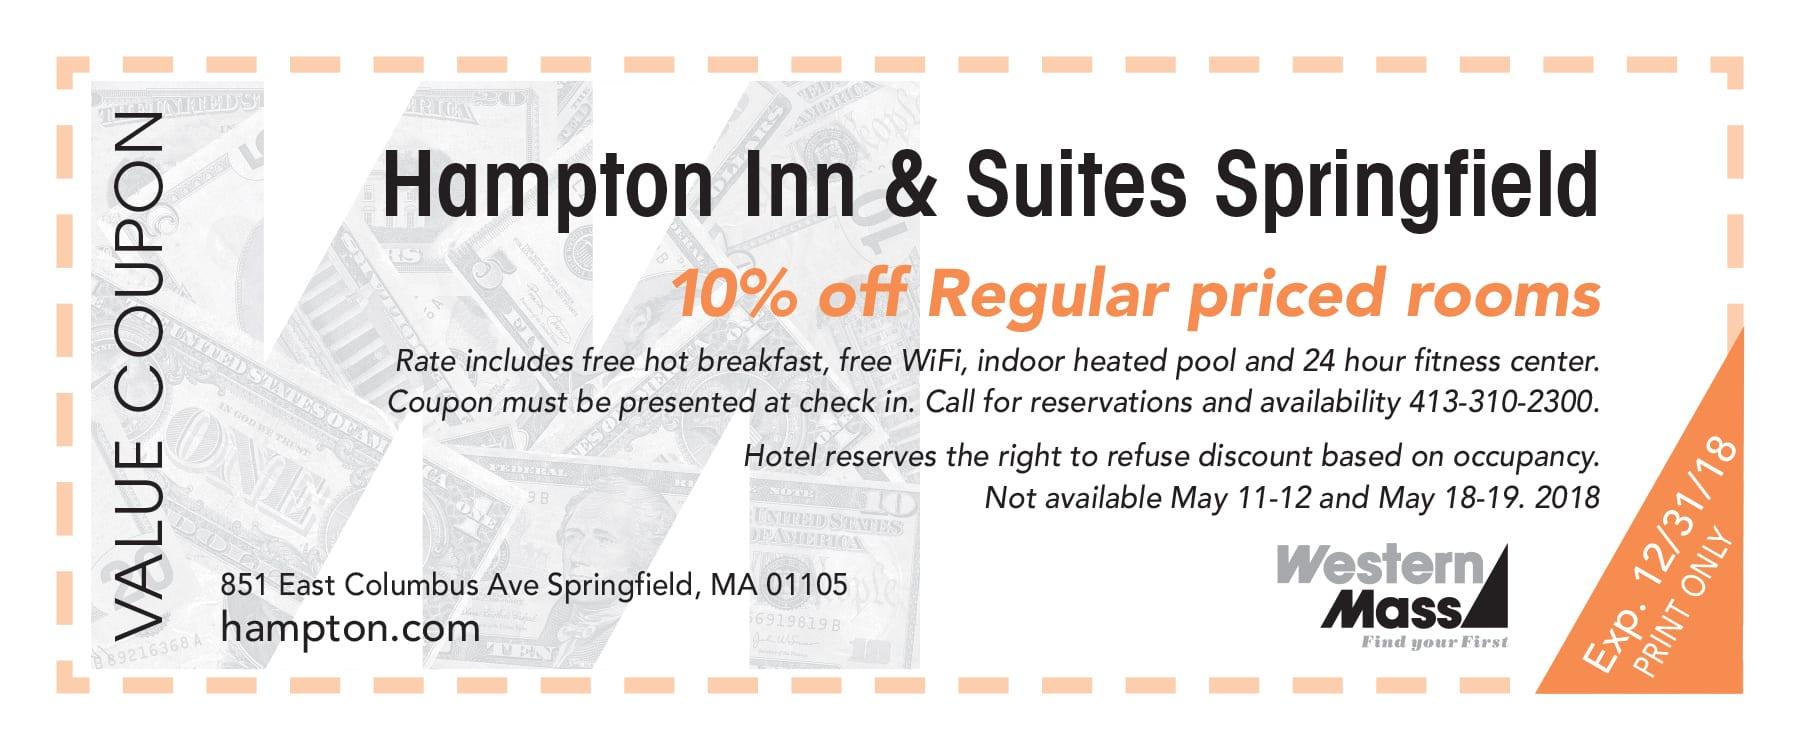 Hampton Inn & Suites Springfield